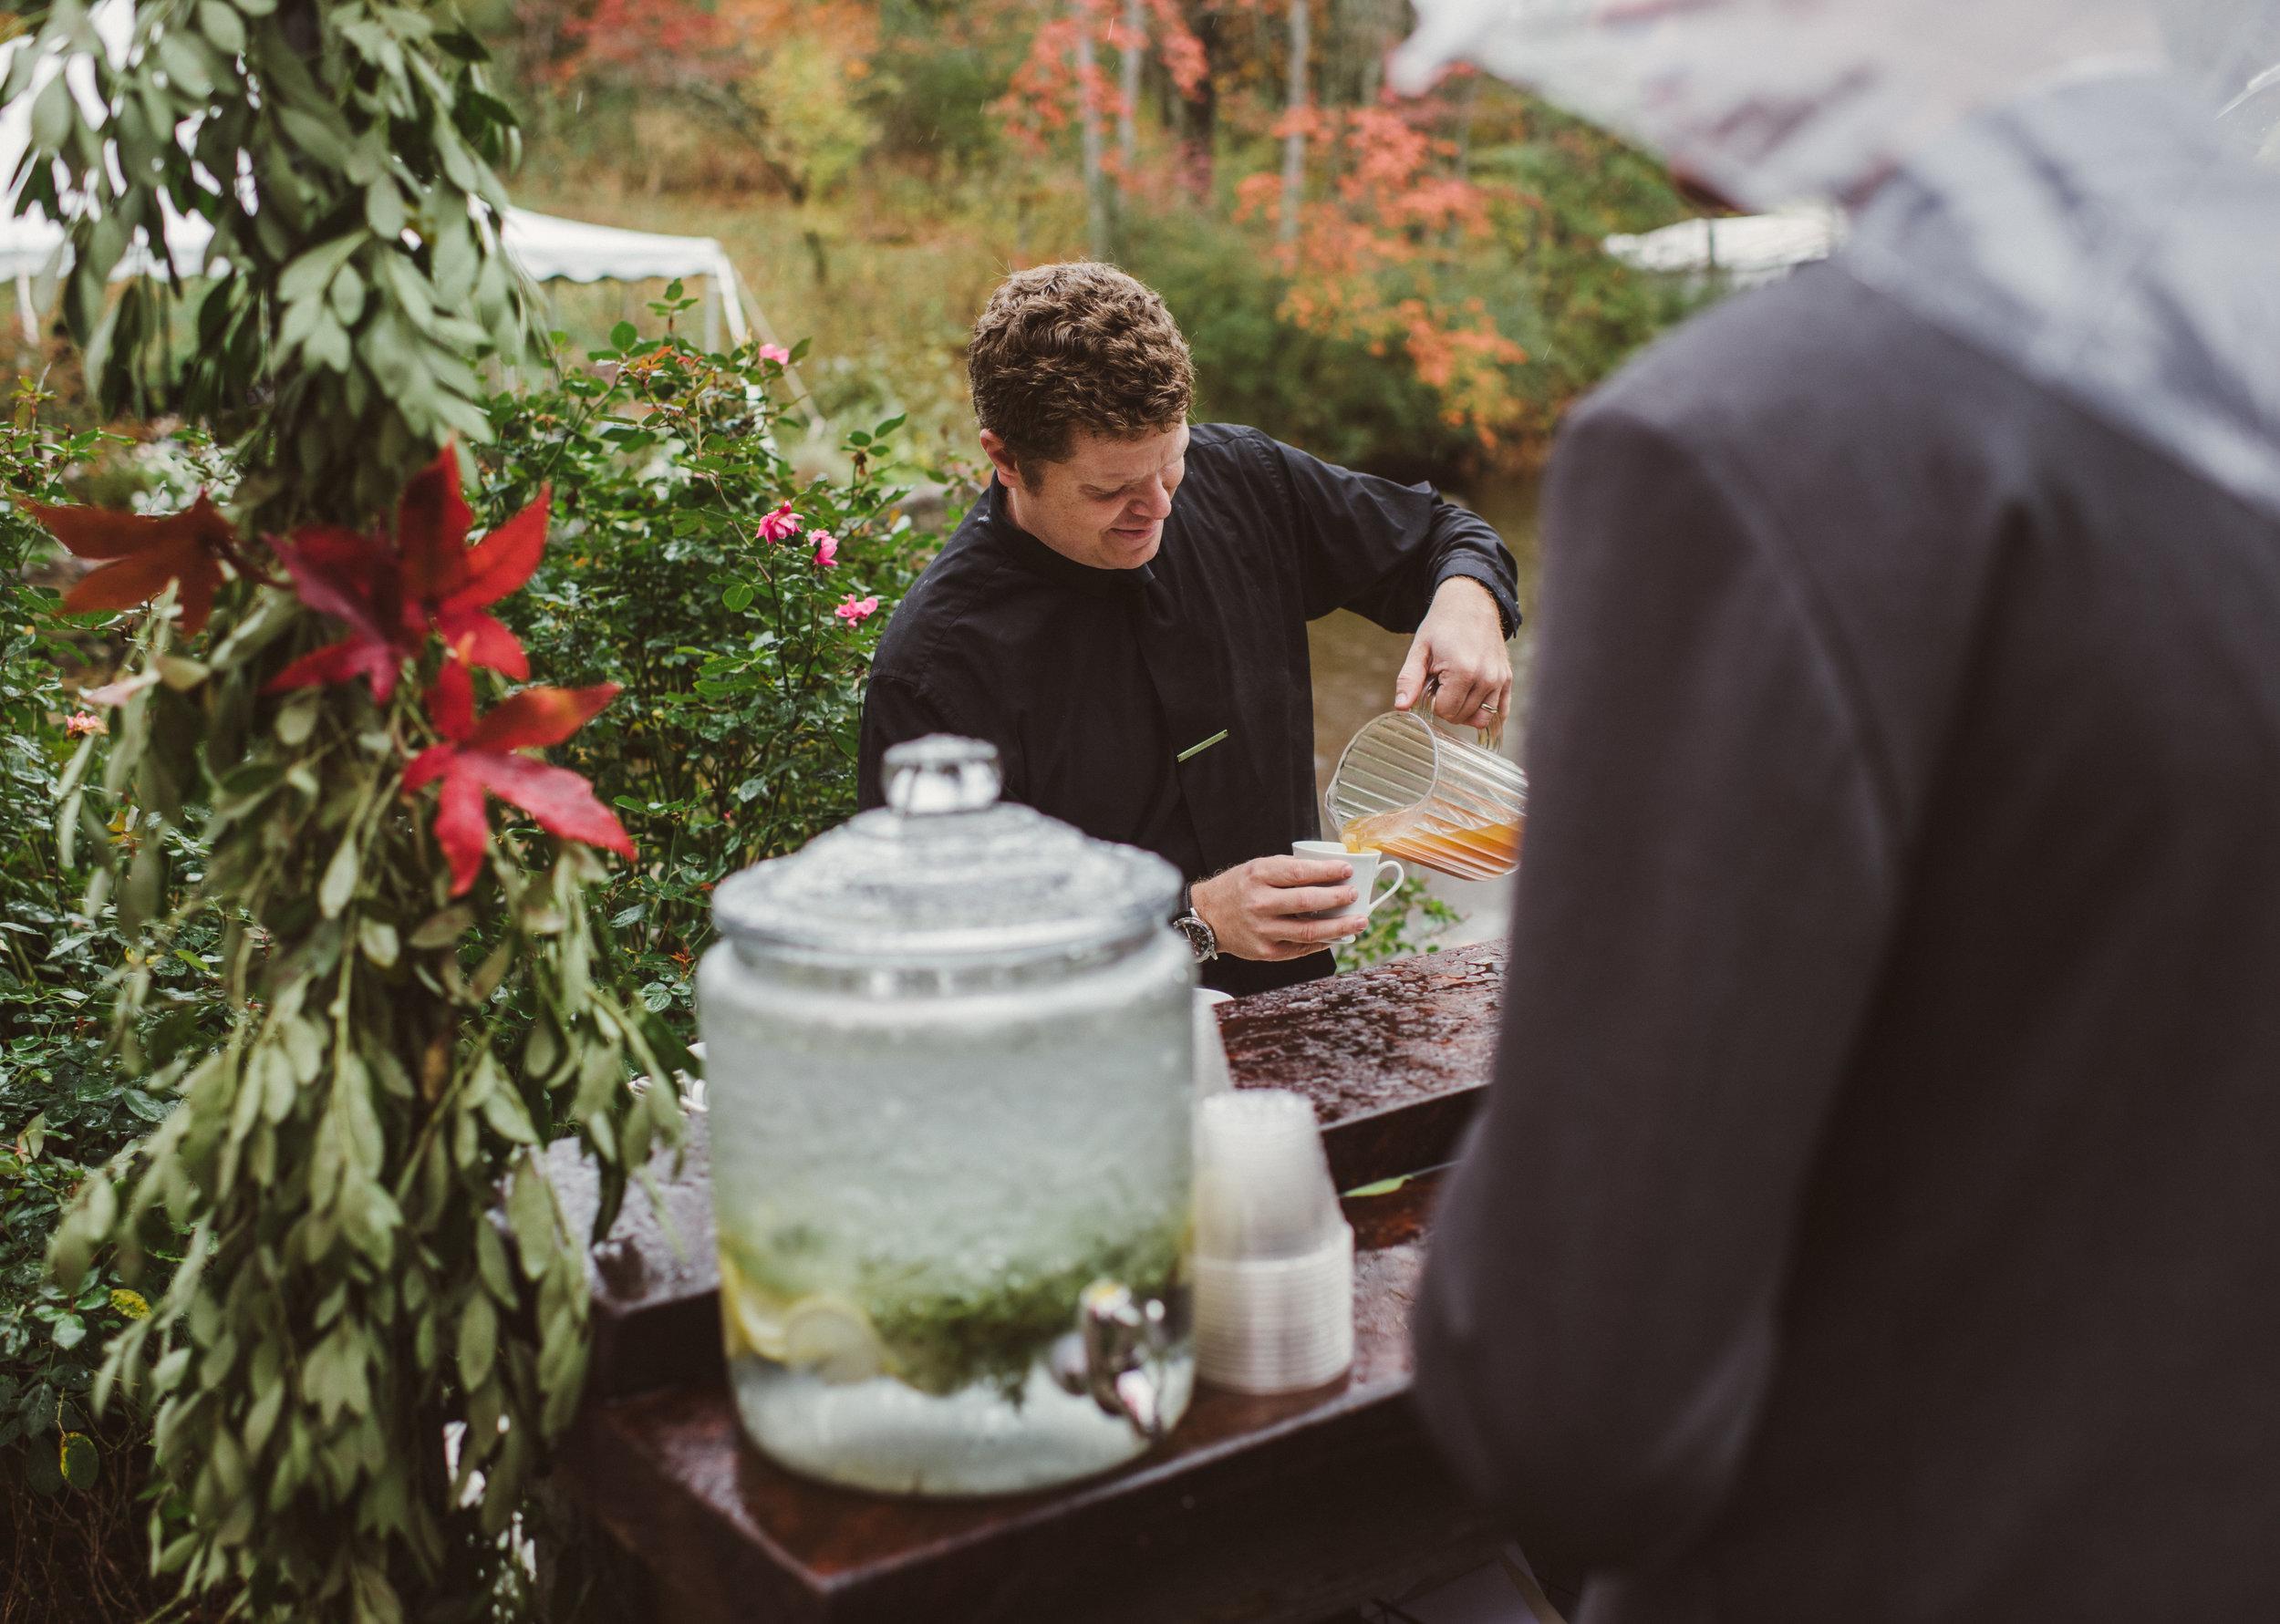 JACQUELINE & ANDREW WARSHAWER -BROOKMILL FARM FALL WEDDING - INTIMATE WEDDING PHOTOGRAPHER - TWOTWENTY by CHI-CHI AGBIM-165.jpg